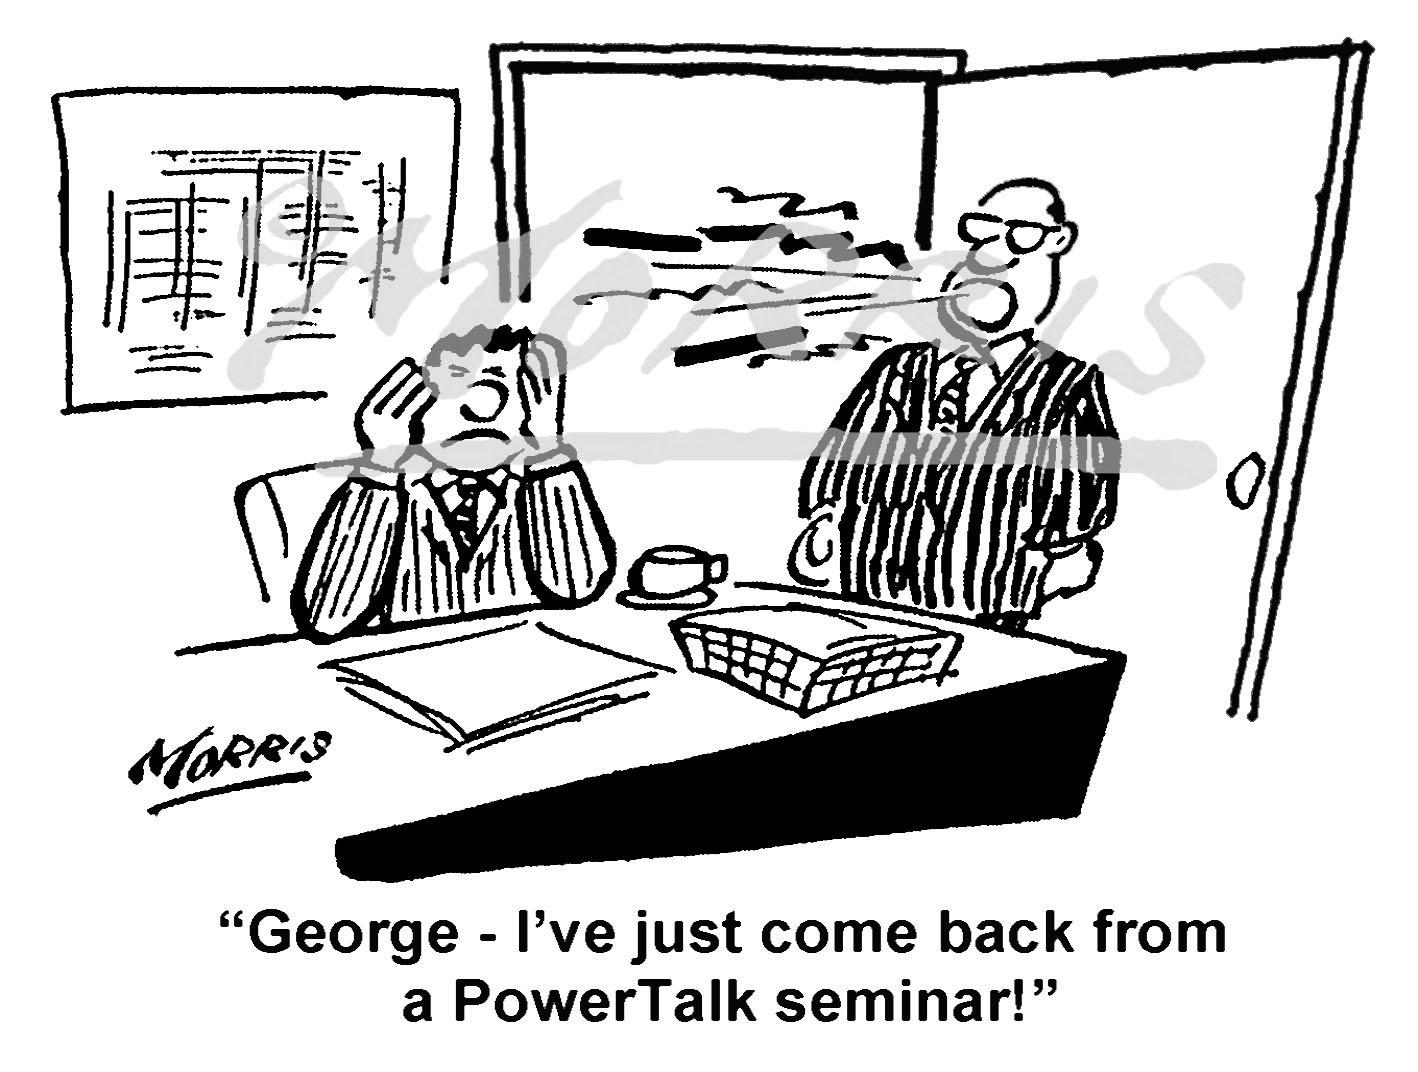 Power talk cartoon, seminar cartoon – Ref: 7392bw